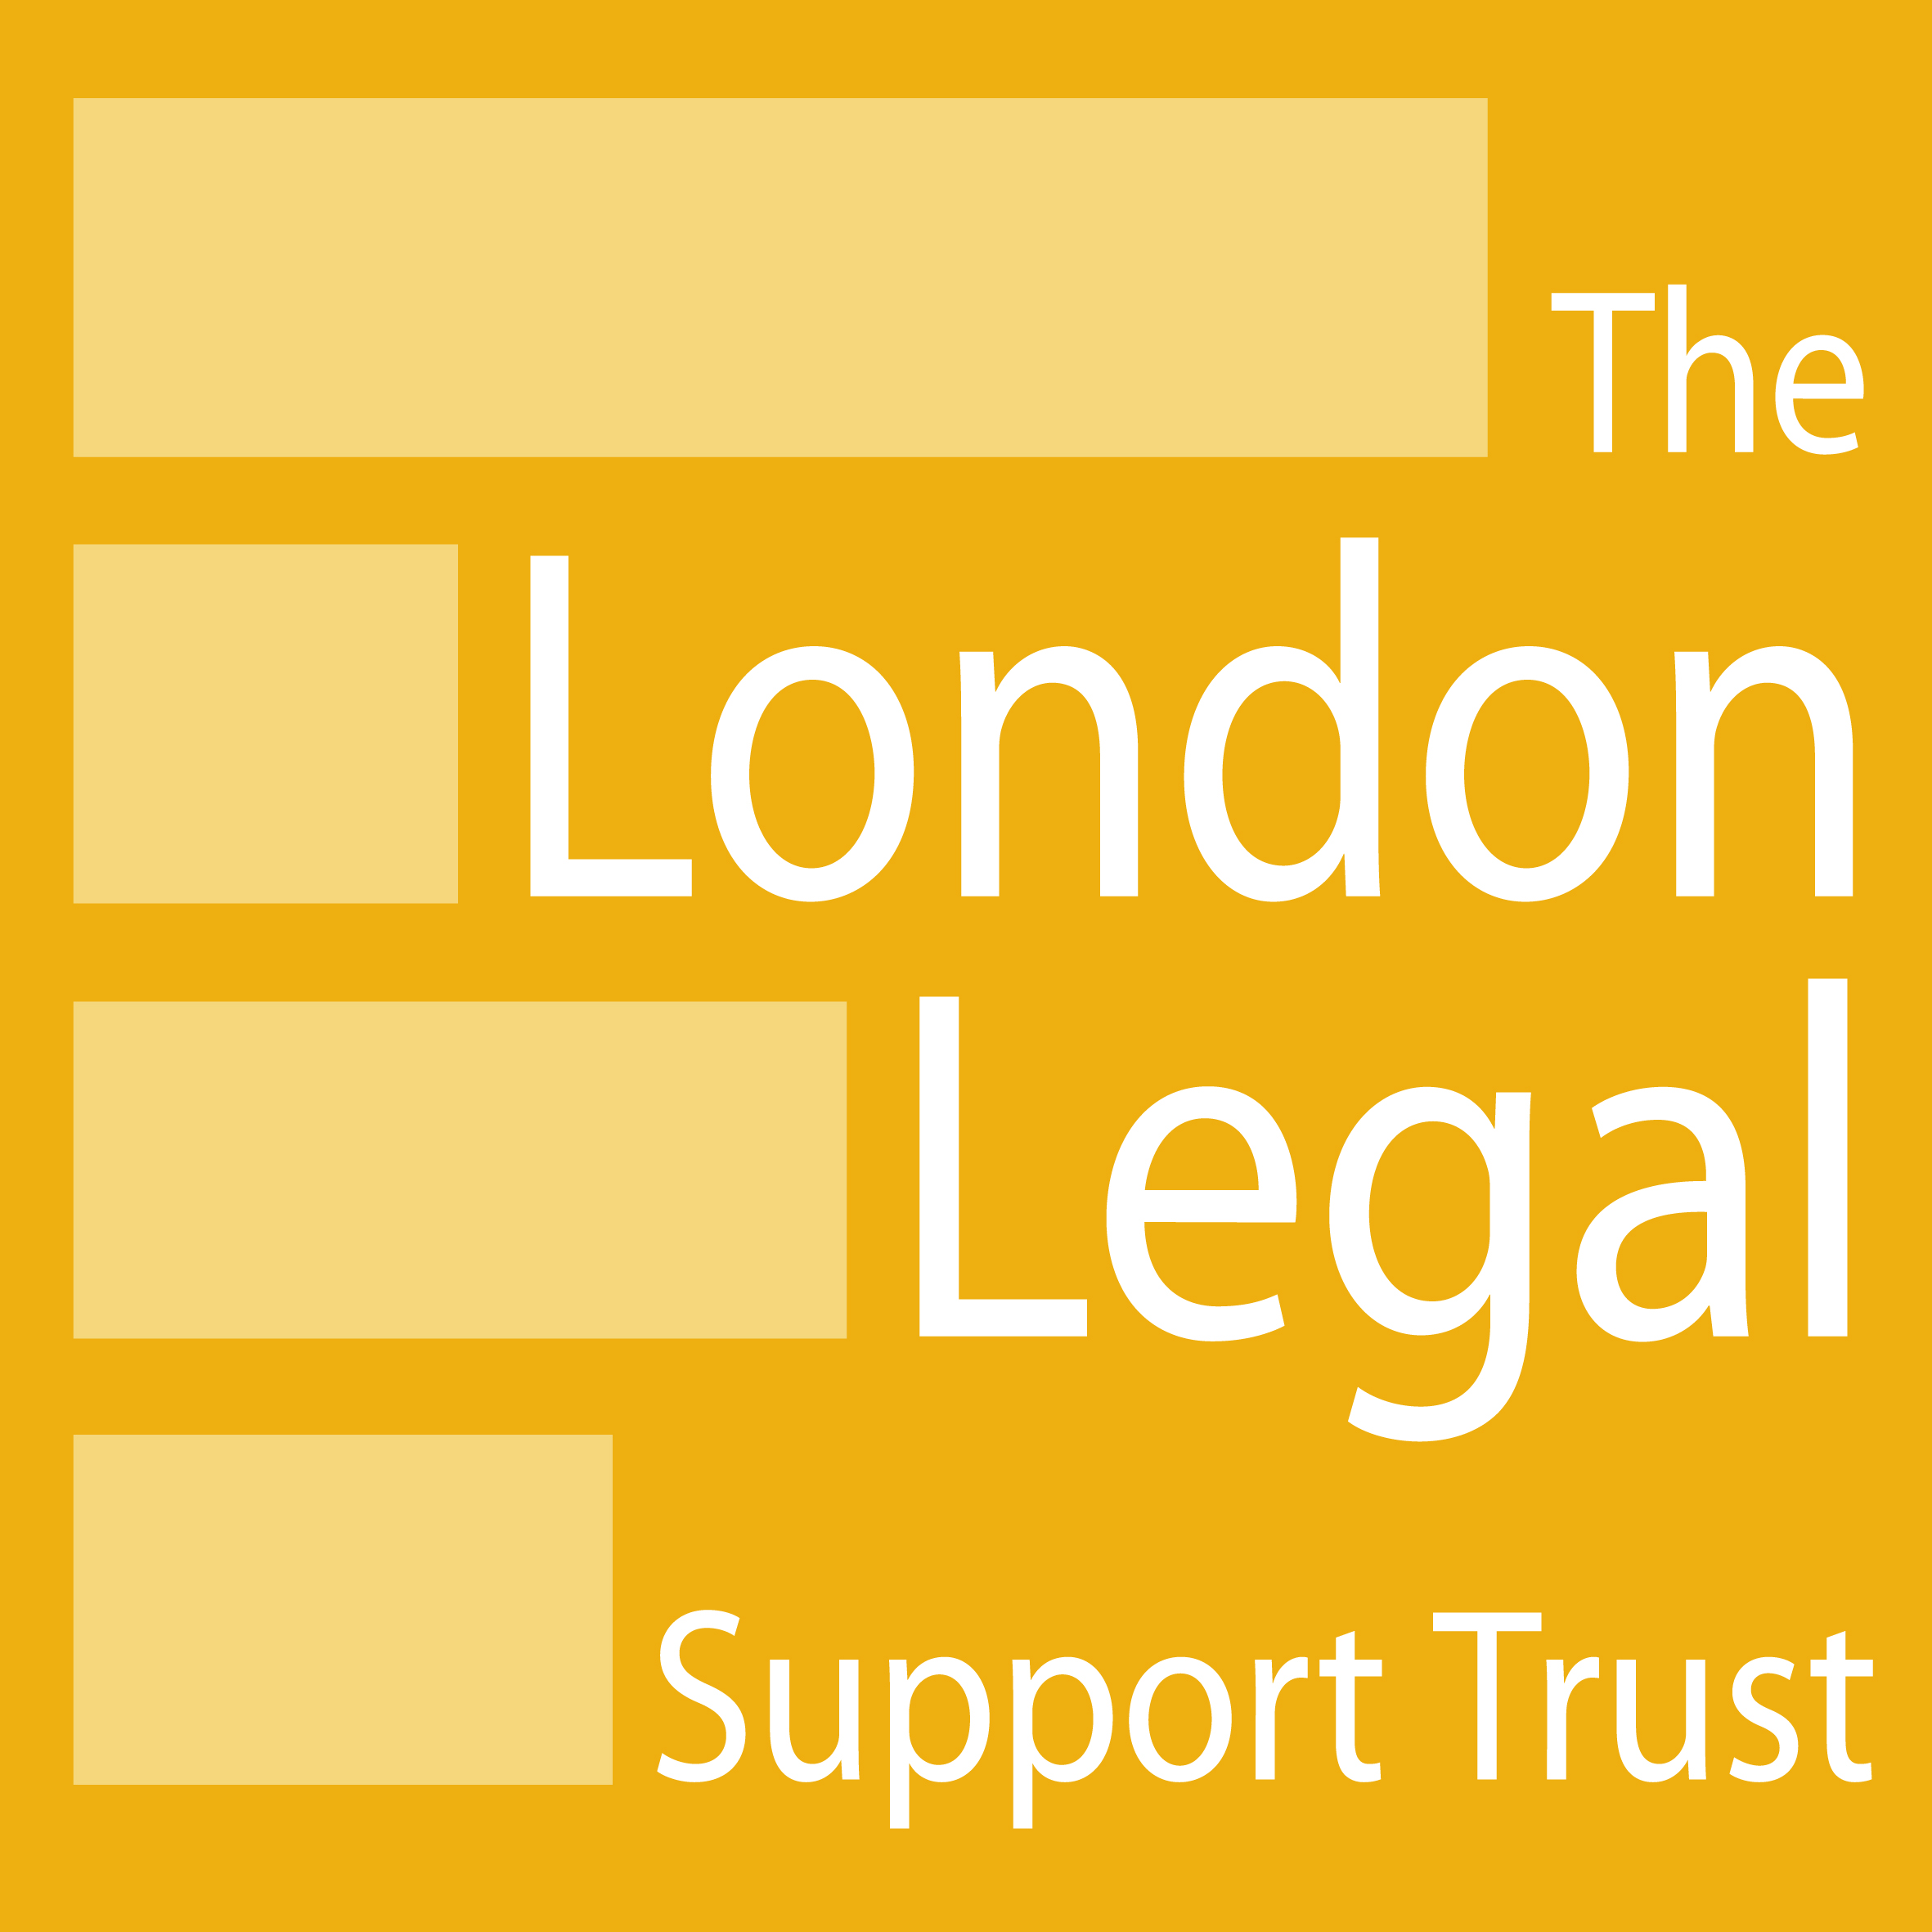 London Legal Support Trust Logo - Recut